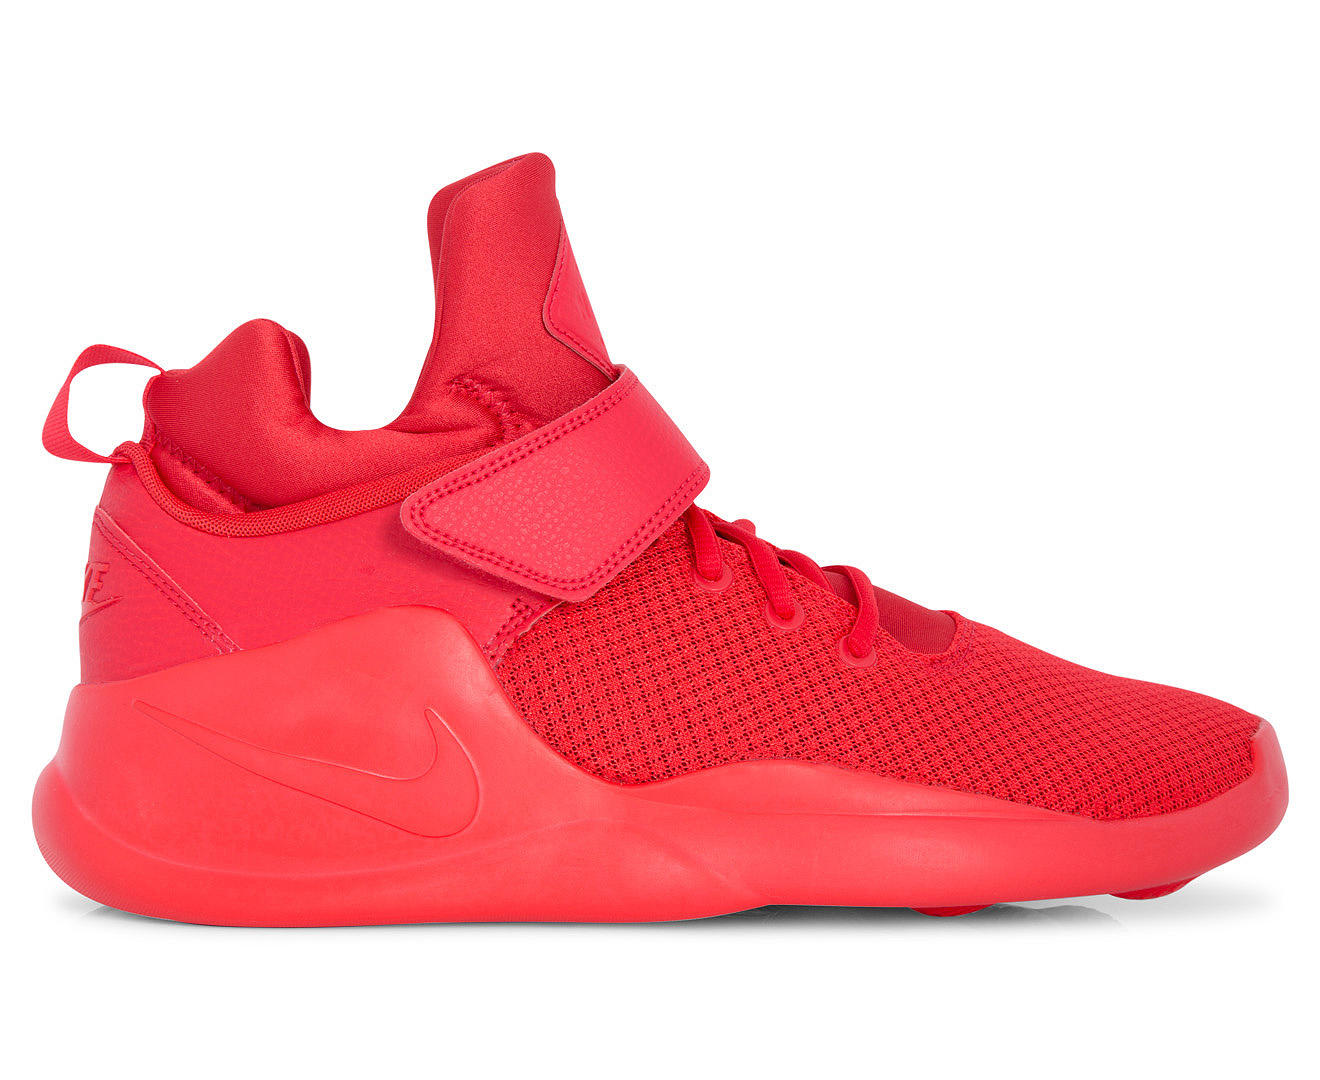 ... promo code for nike mens kwazi shoe action red catch.au 08305 33959 335dd59eb